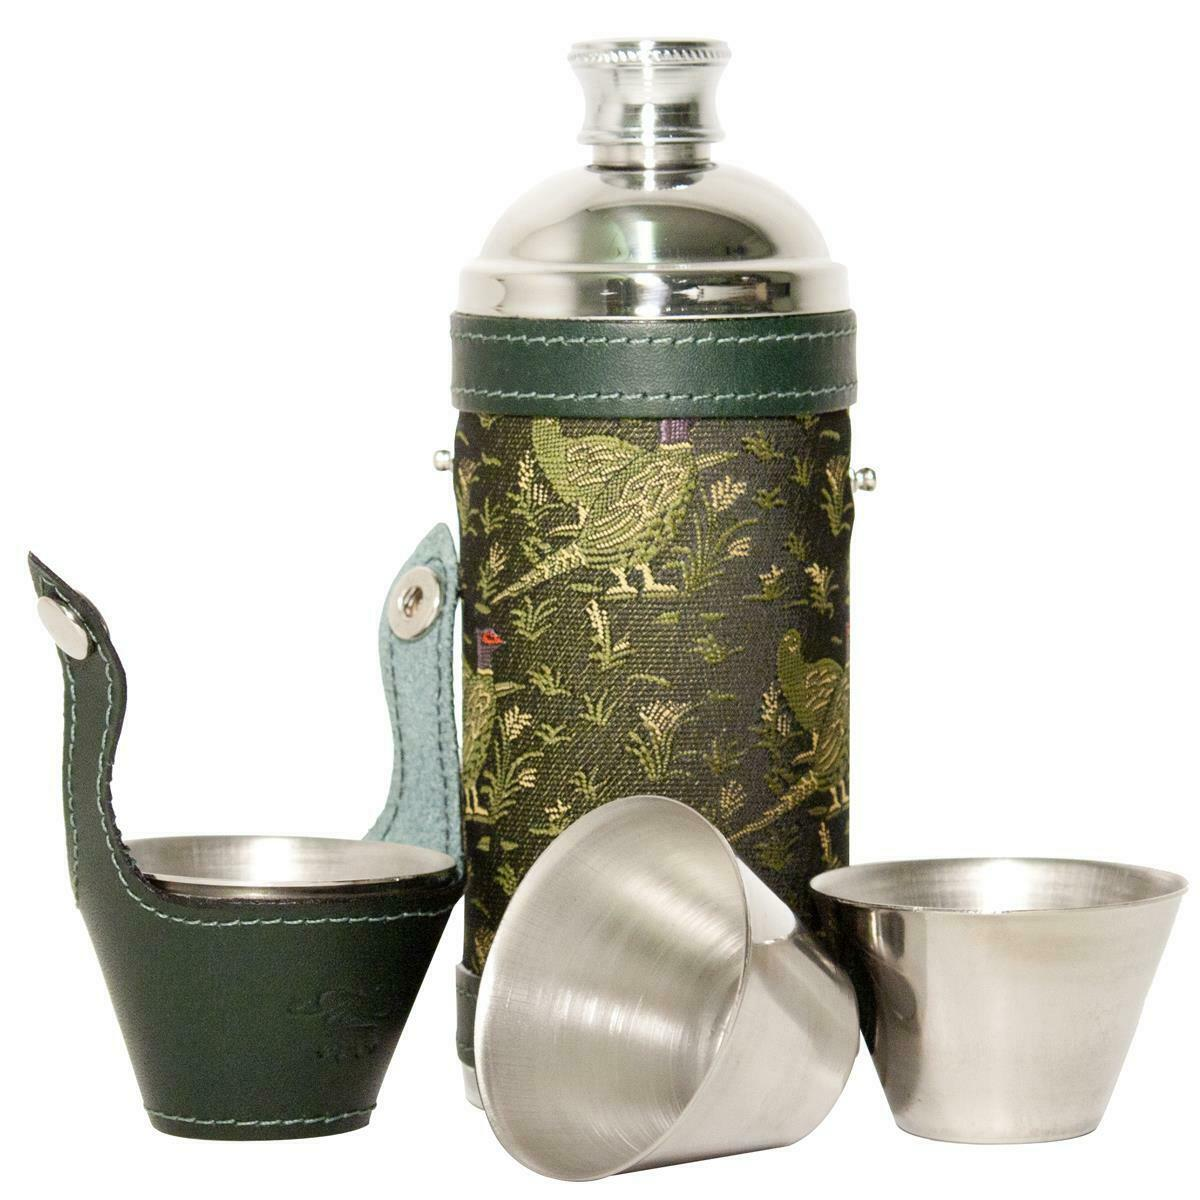 Bisley Pheasant Green 8oz Hunters Flask & Cup Set